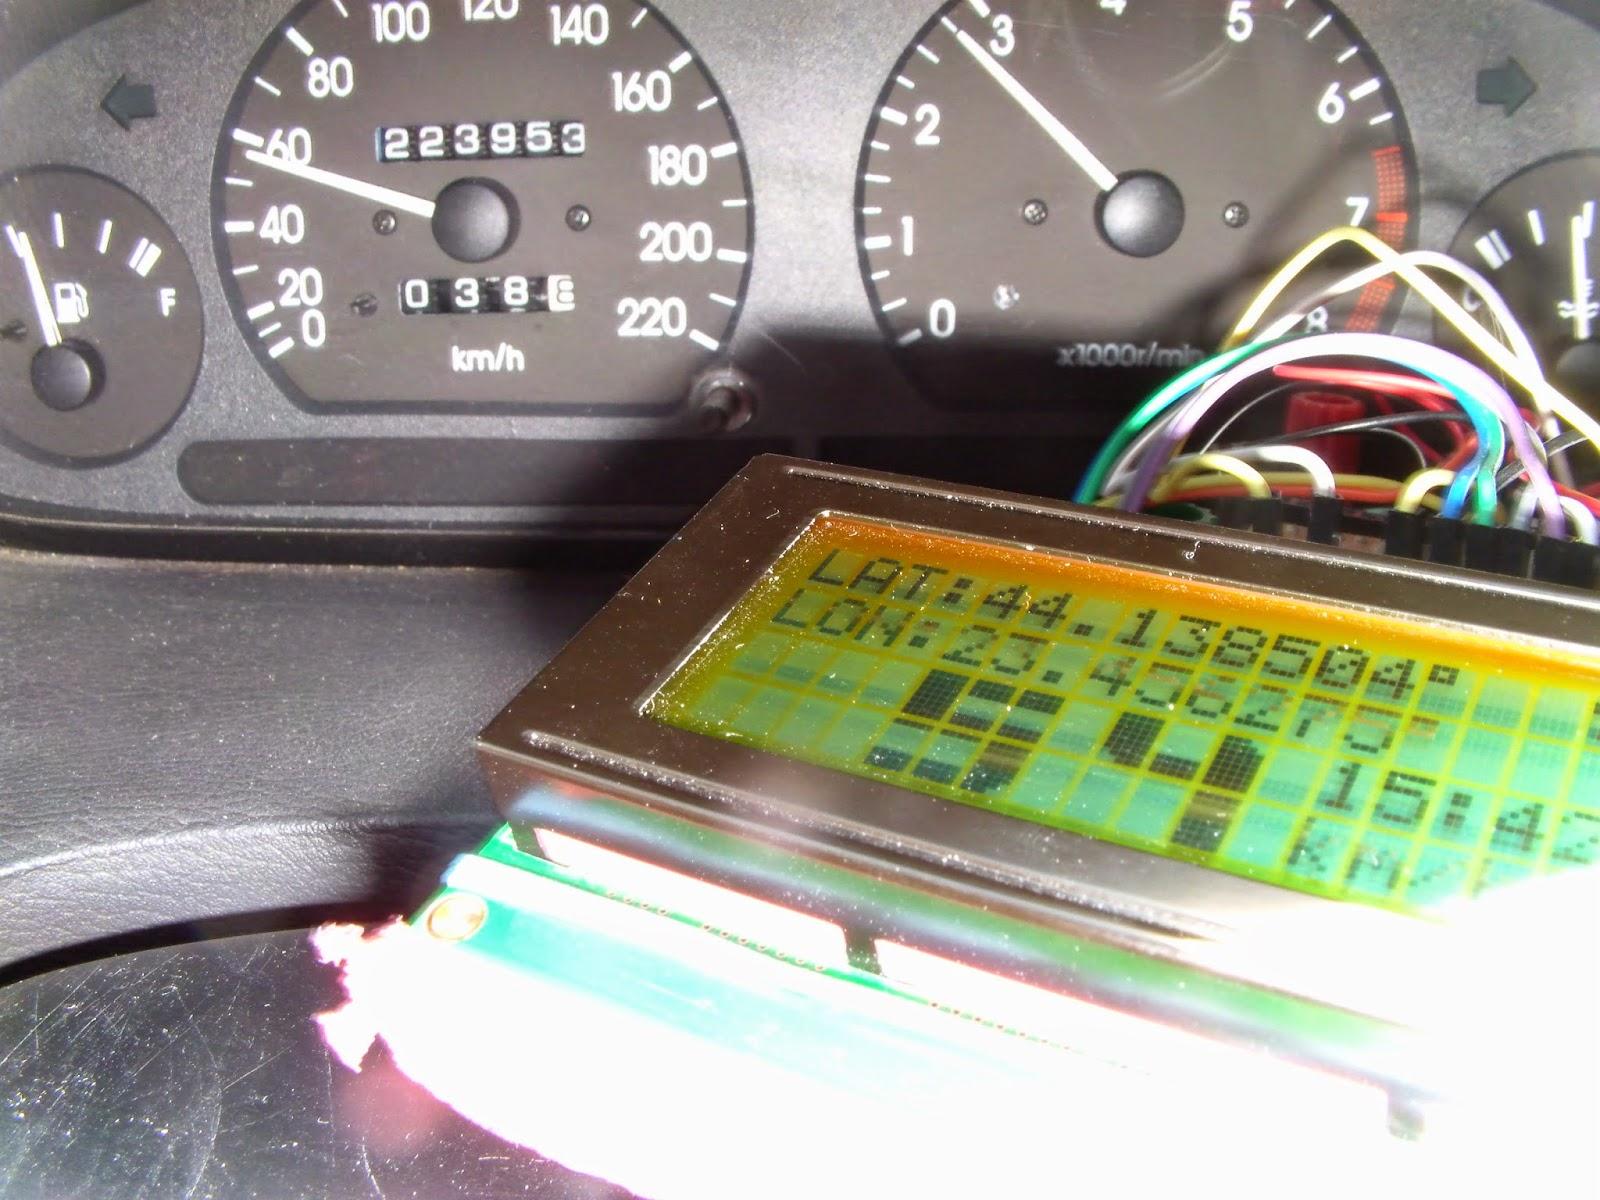 Arduino tehniq old gps receiver and speedometer